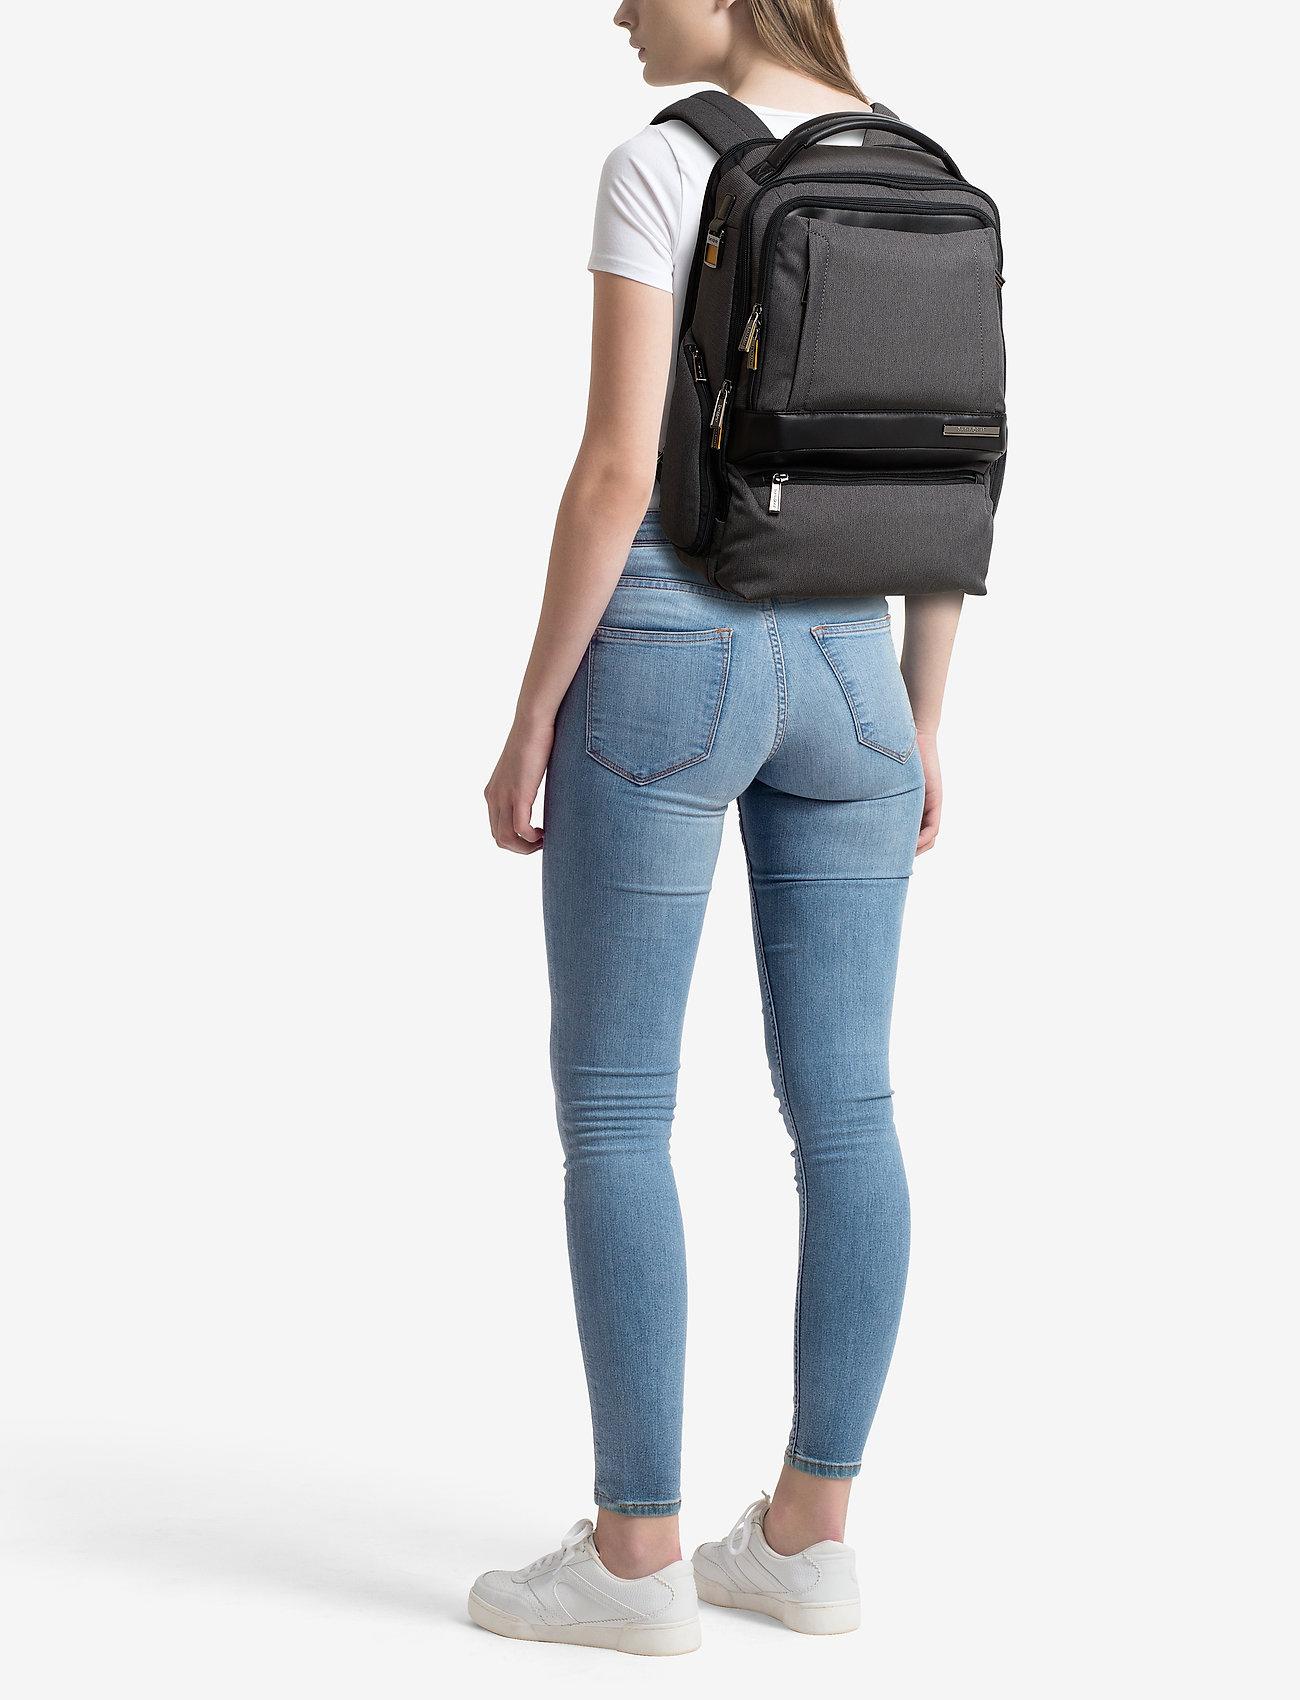 "Samsonite Check Mate Laptop Backpack 15.6"" Double"